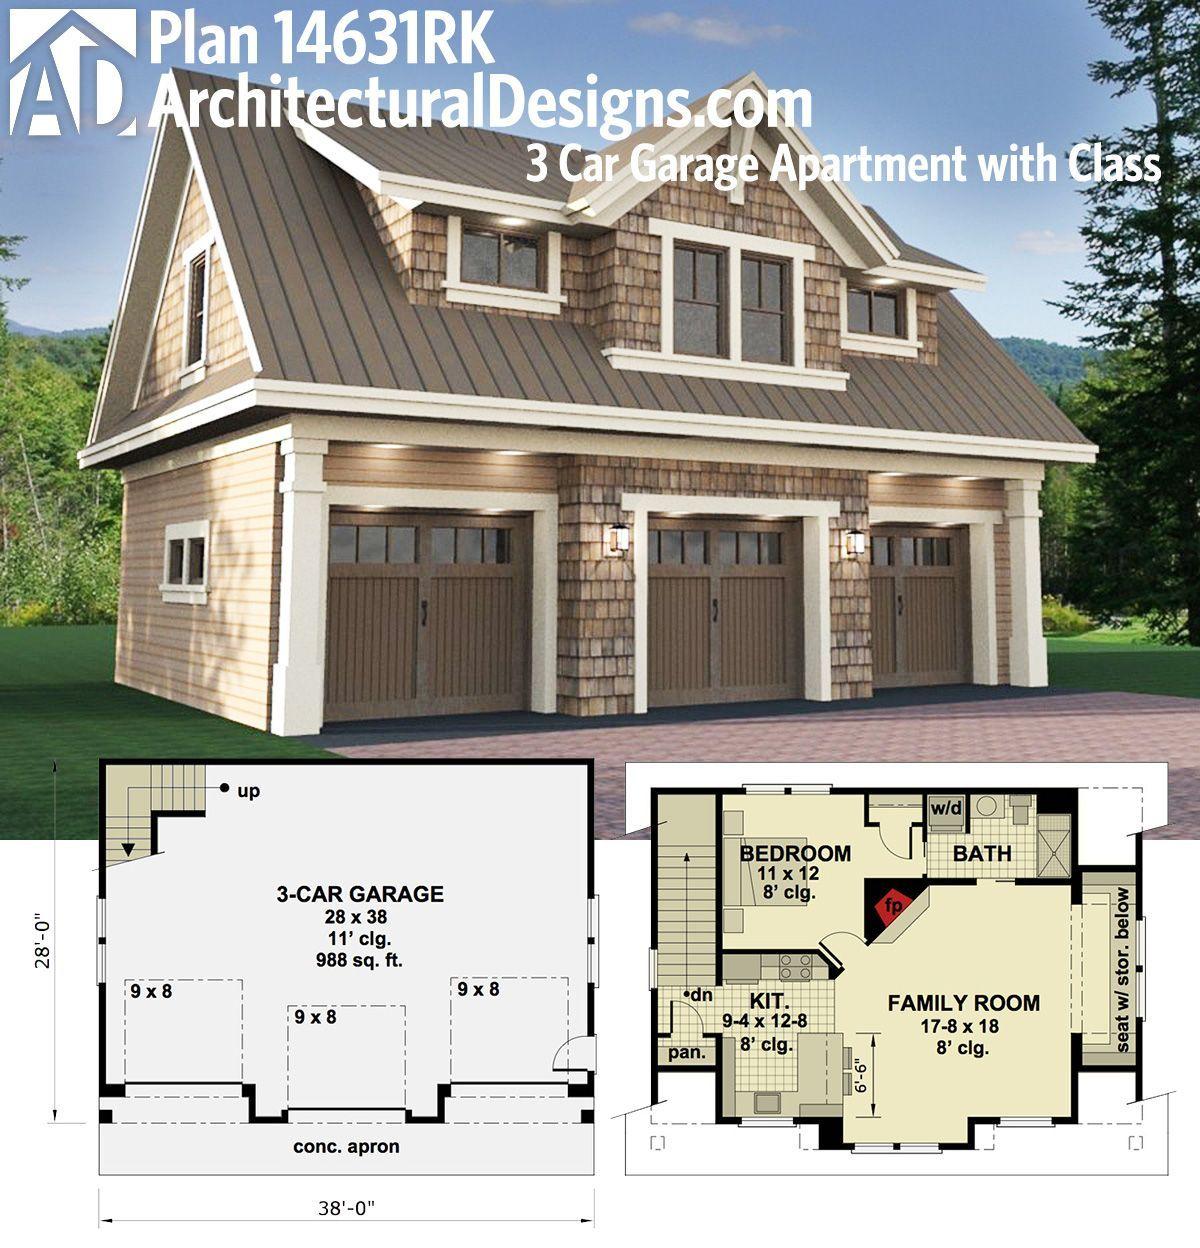 Plan 14631RK 3 Car Garage Apartment with Class – Add On Garage Plans